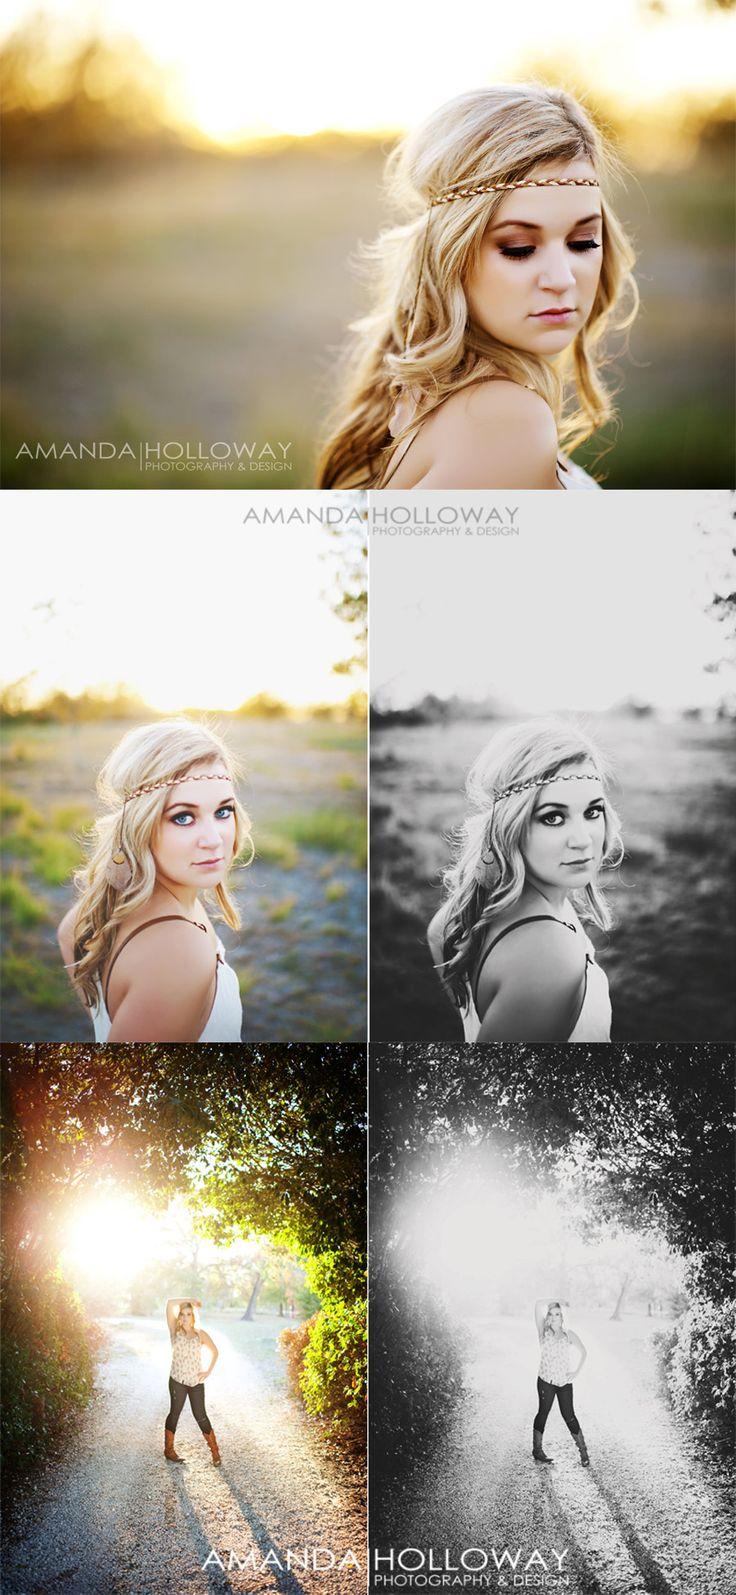 photos by Amanda Holloway! Love the photographer, model, and idea!